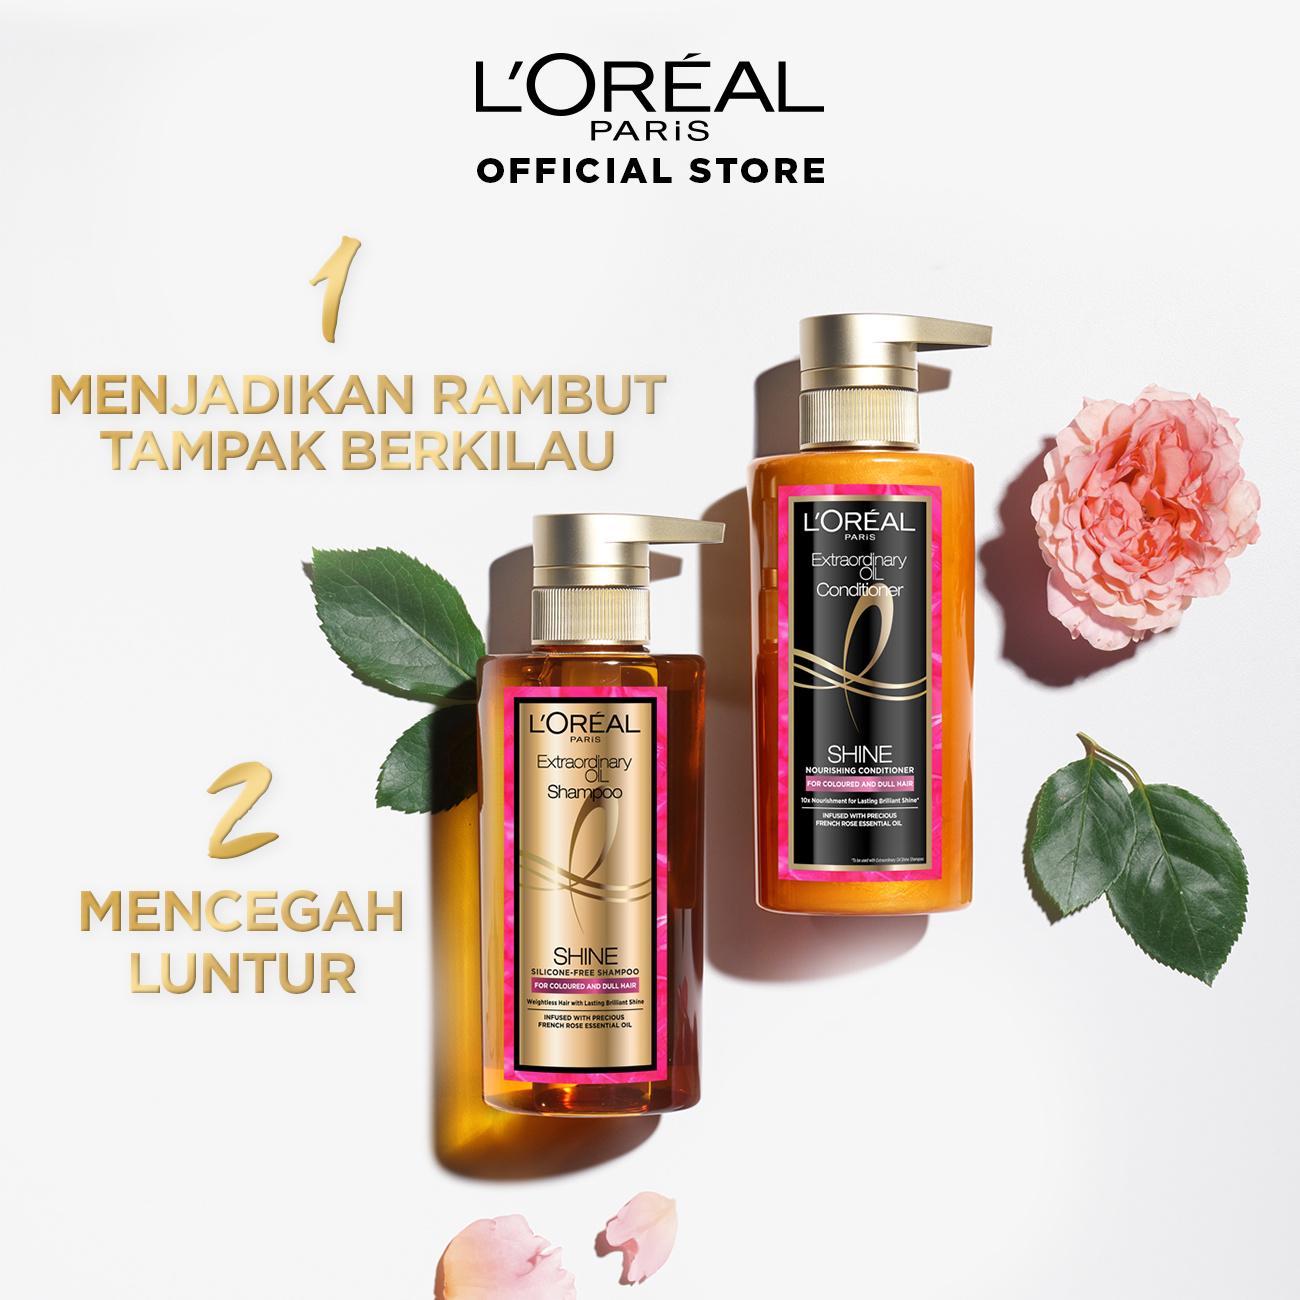 L'Oreal Paris Extraordinary Oil Premium Shampoo Shine- 440ml Twinpack-3